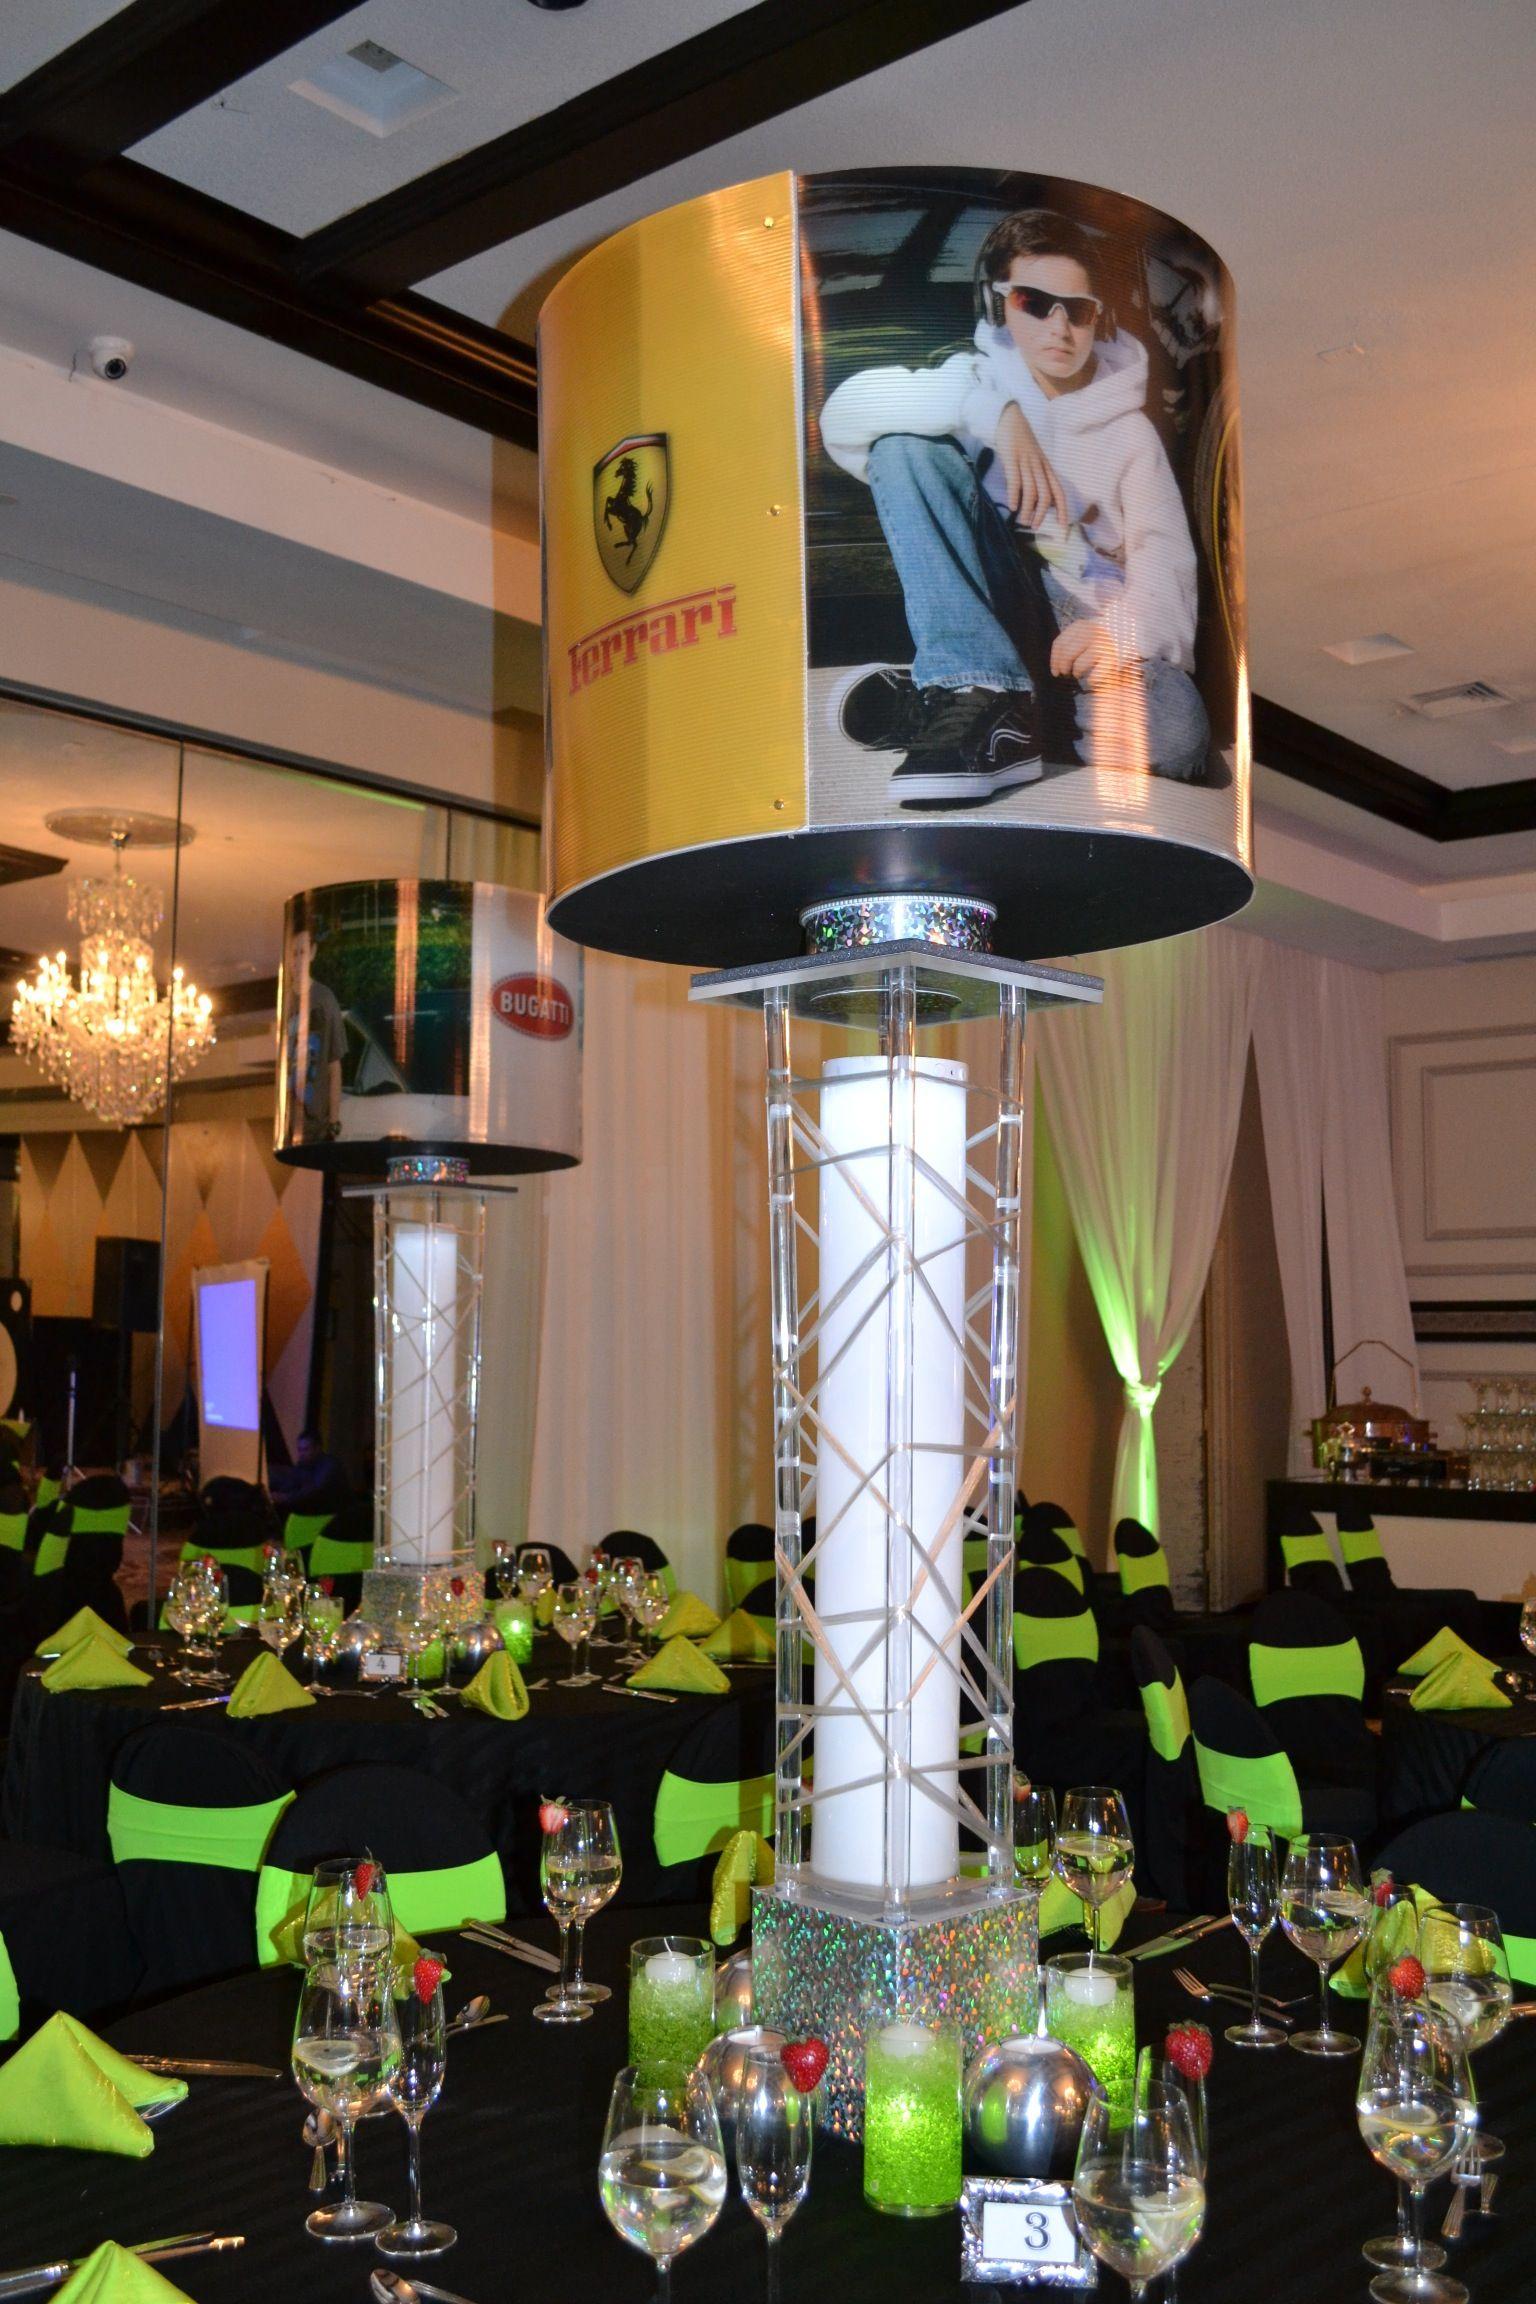 Car Theme Bar Mitzvah Event Decor Spinning Centerpieces ...